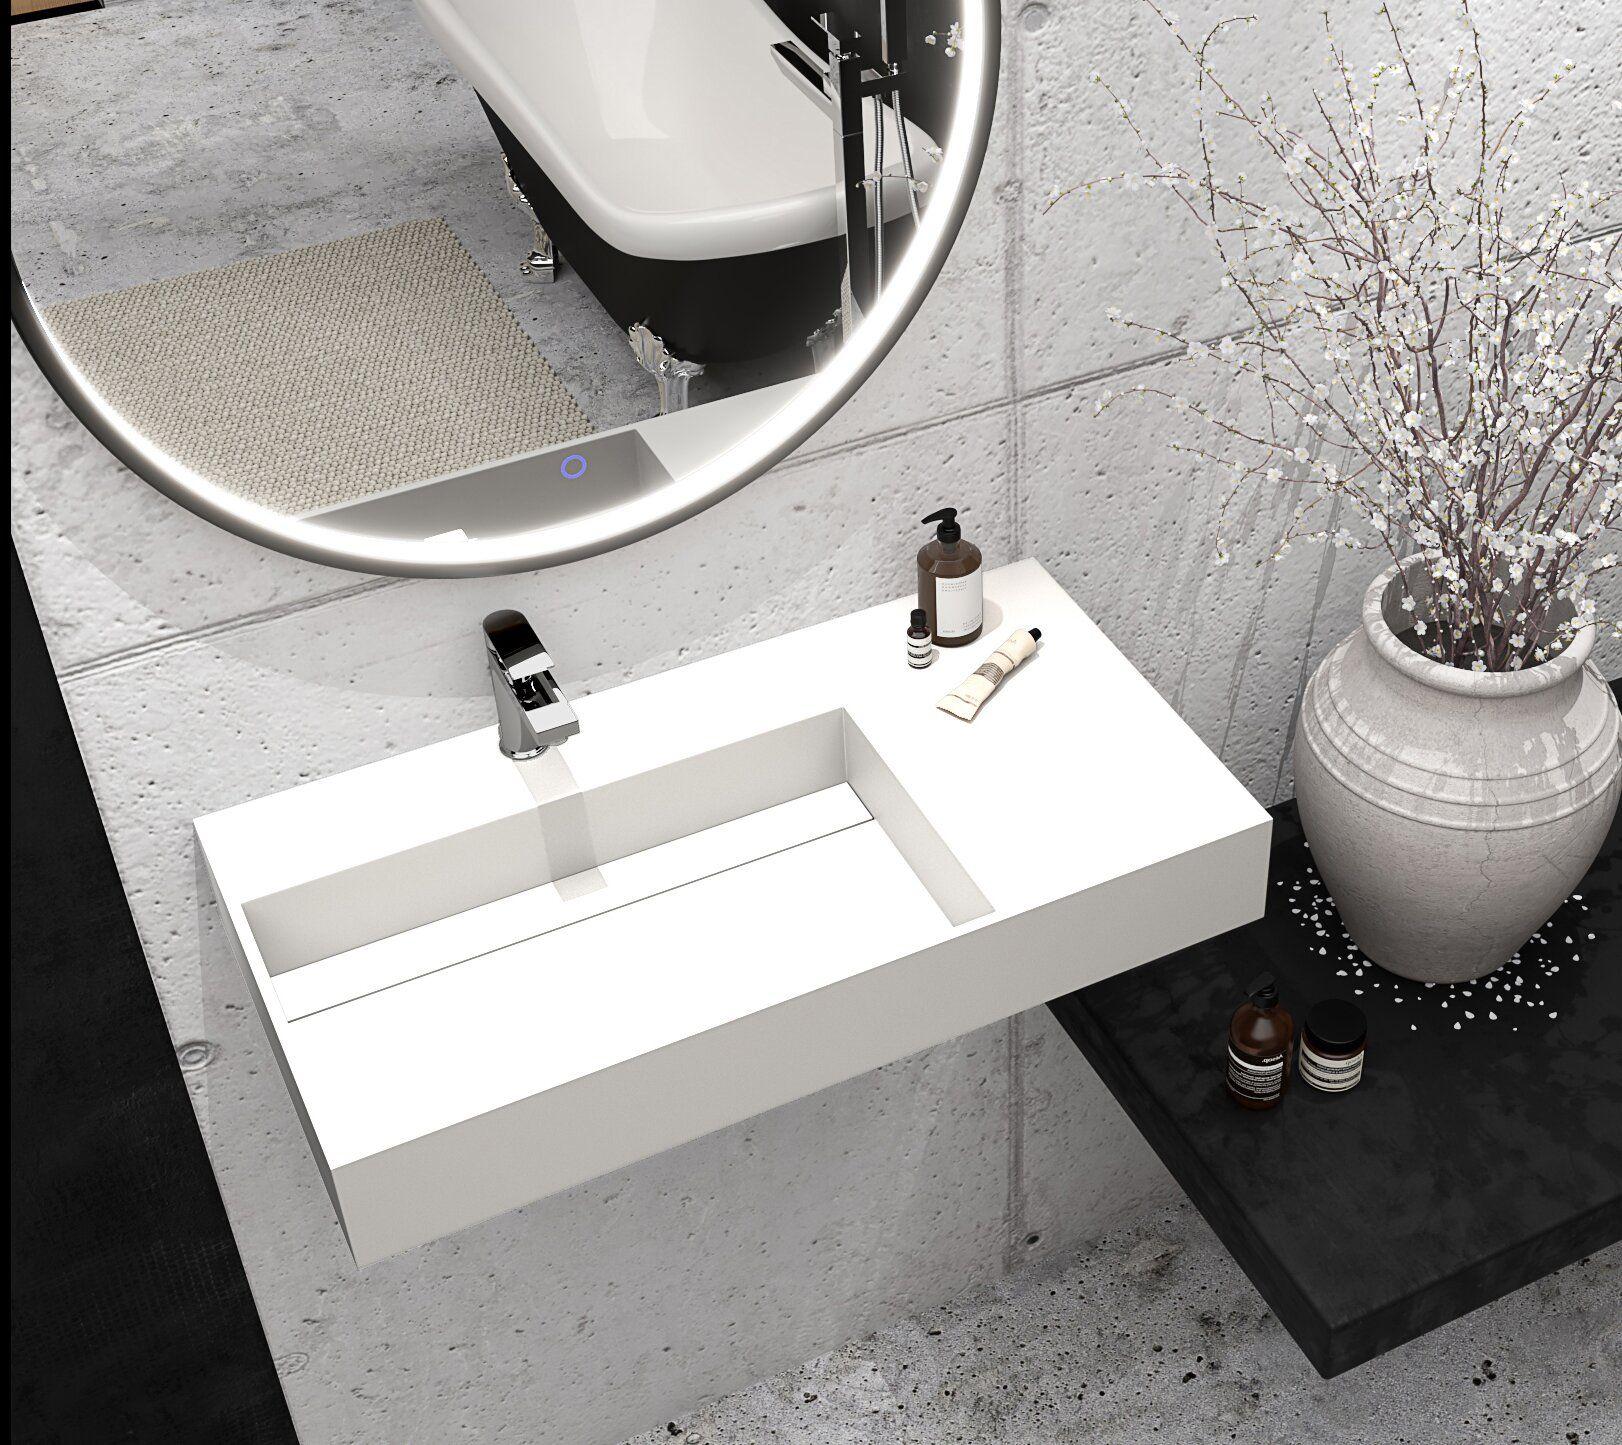 Boyter Stone Rectangular Wall Mount Bathroom Sink Wall Mounted Bathroom Sink Sink Wall Mounted Bathroom Sinks [ 1445 x 1622 Pixel ]